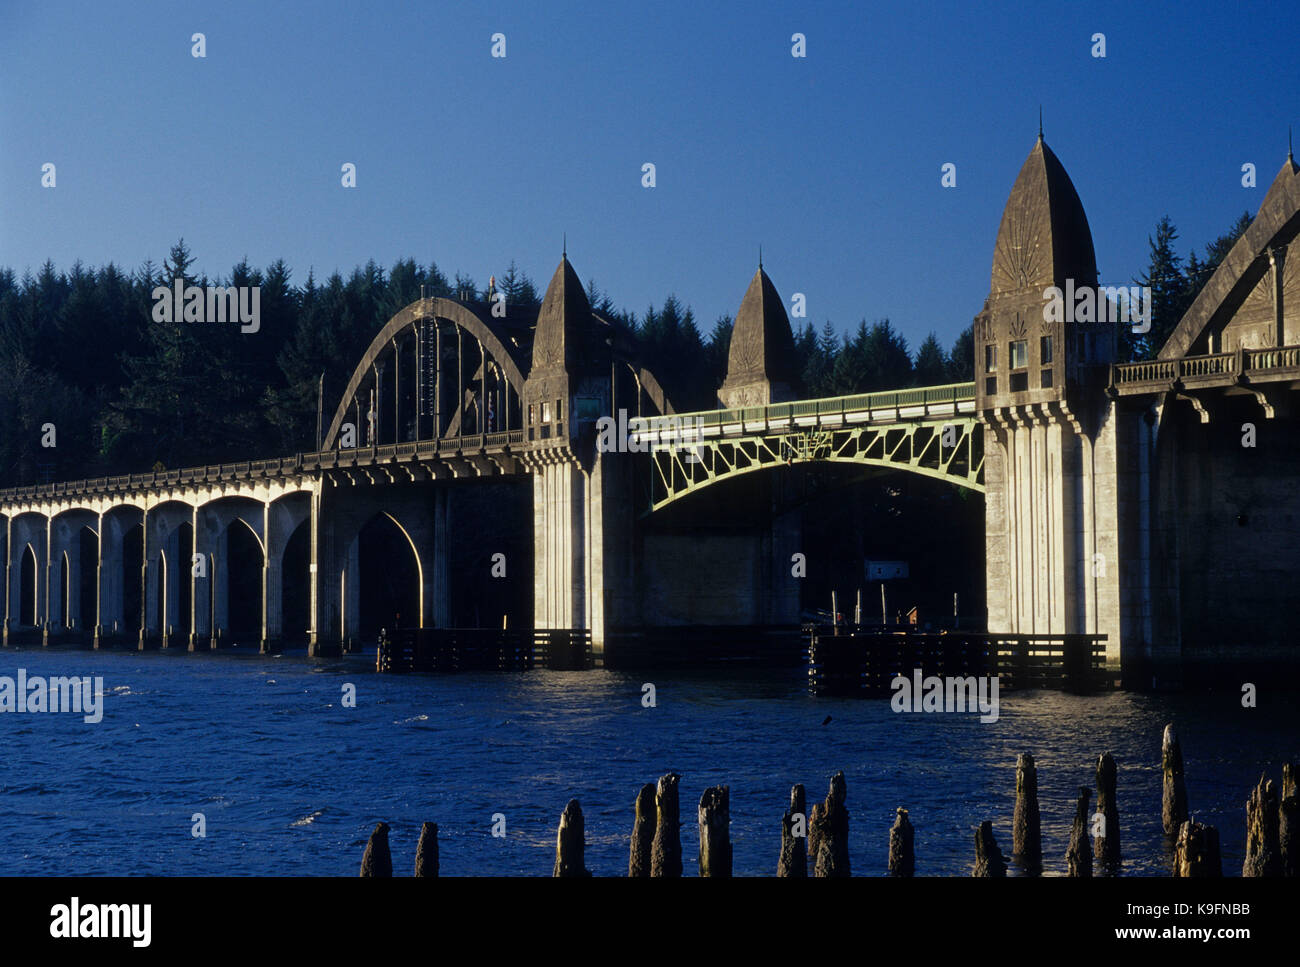 Siuslaw River Bridge, Florence, Oregon Stockbild